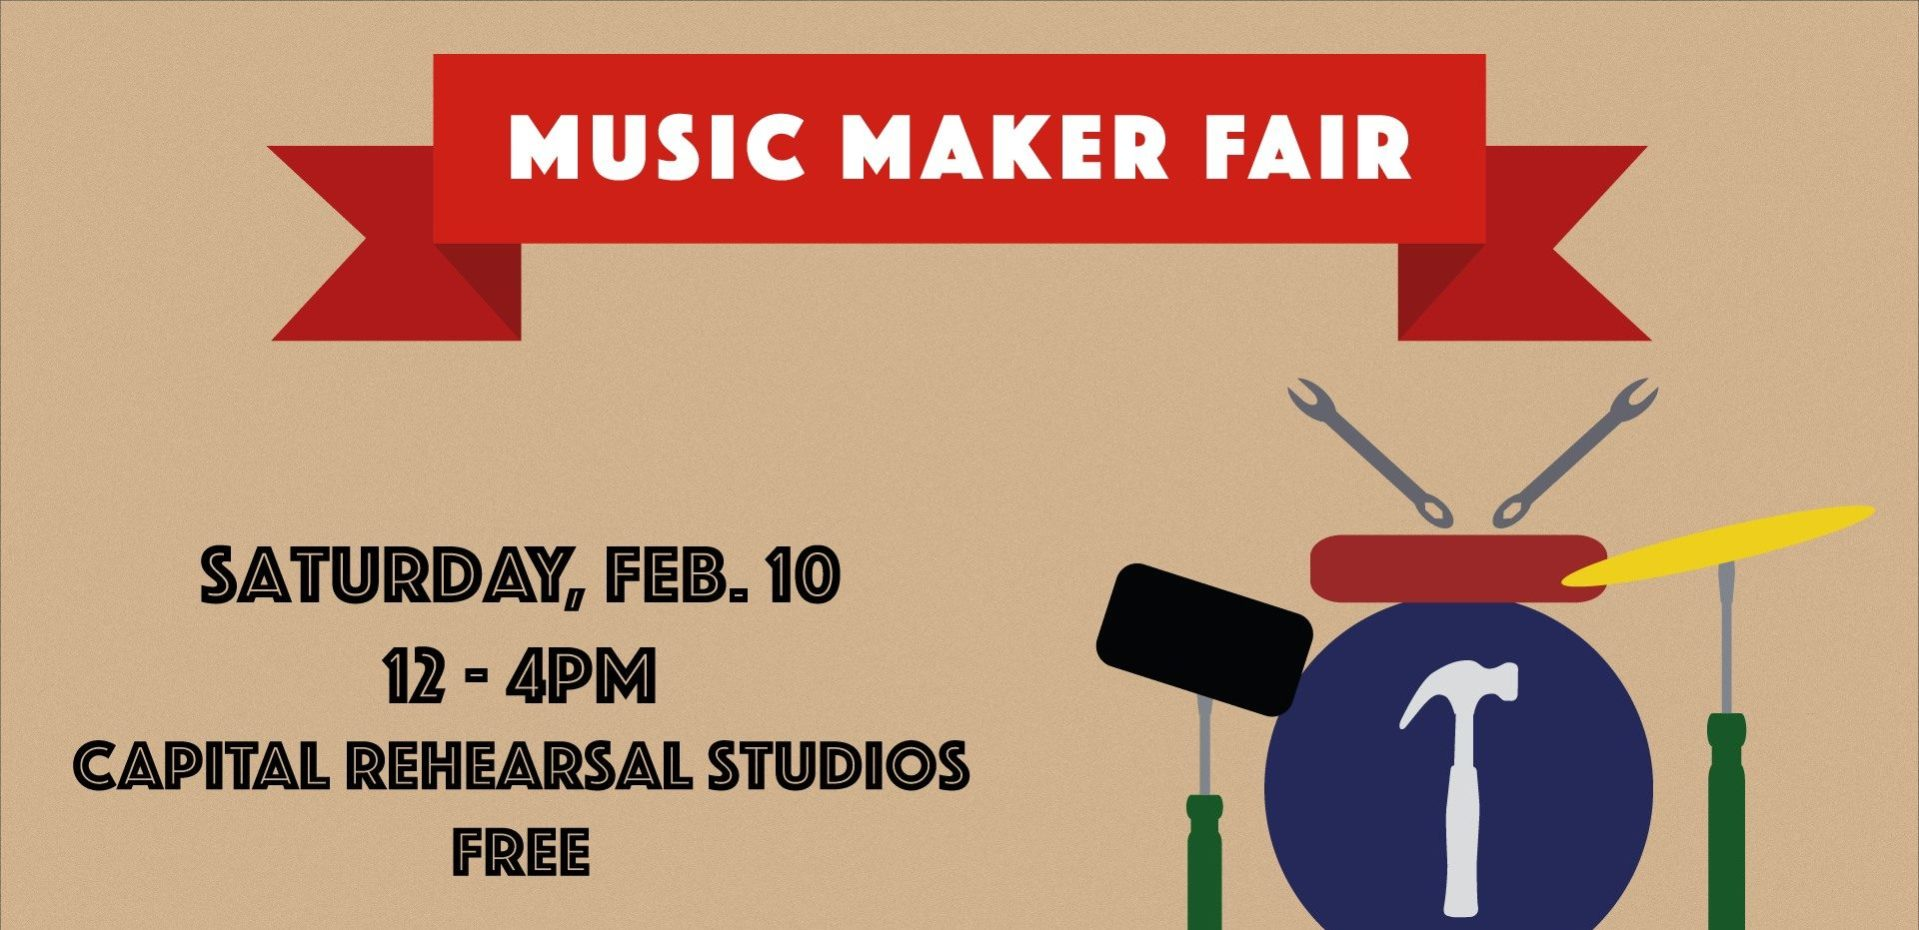 music maker fair trade show